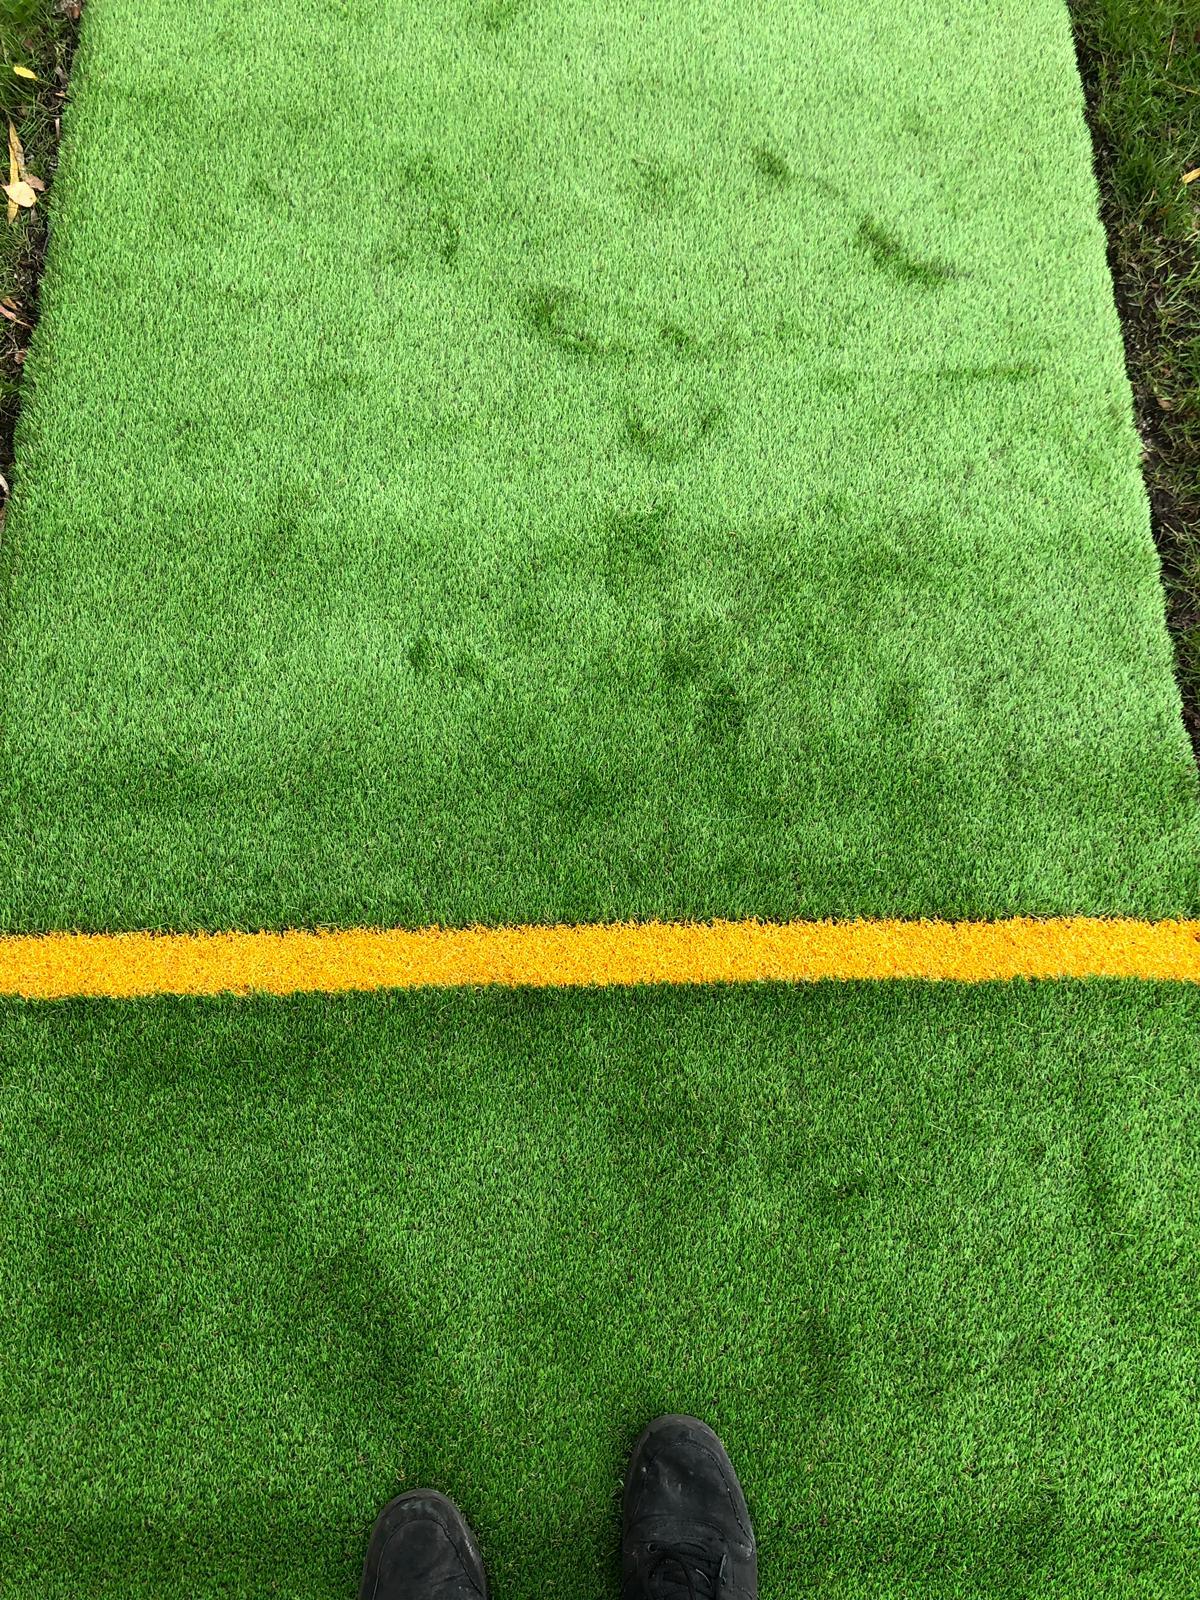 grass-track-way-1jpeg